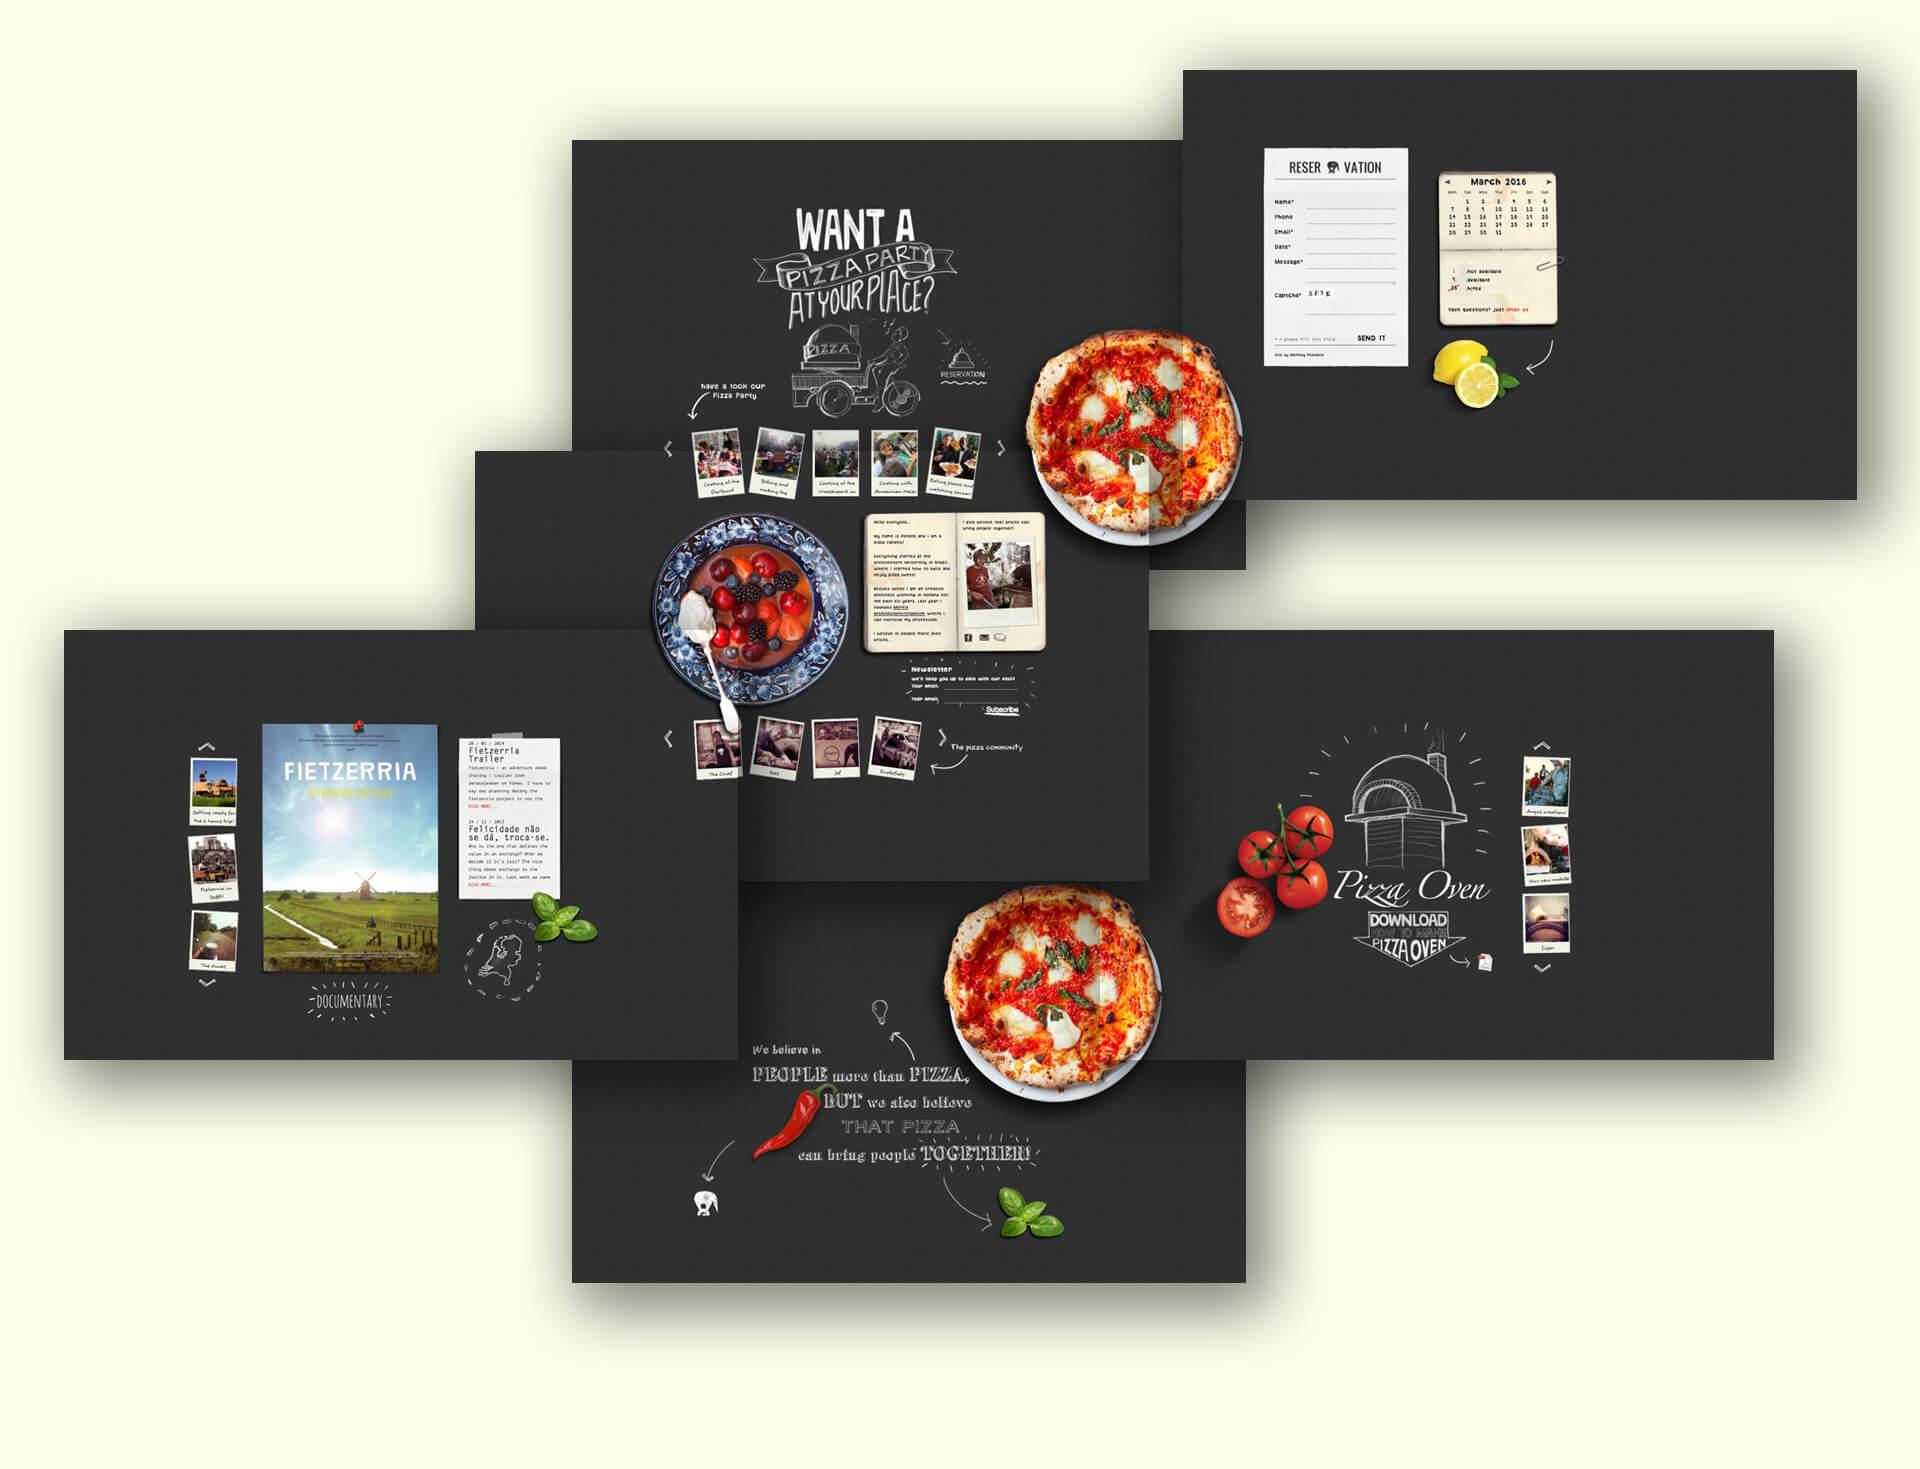 Fietzerria web